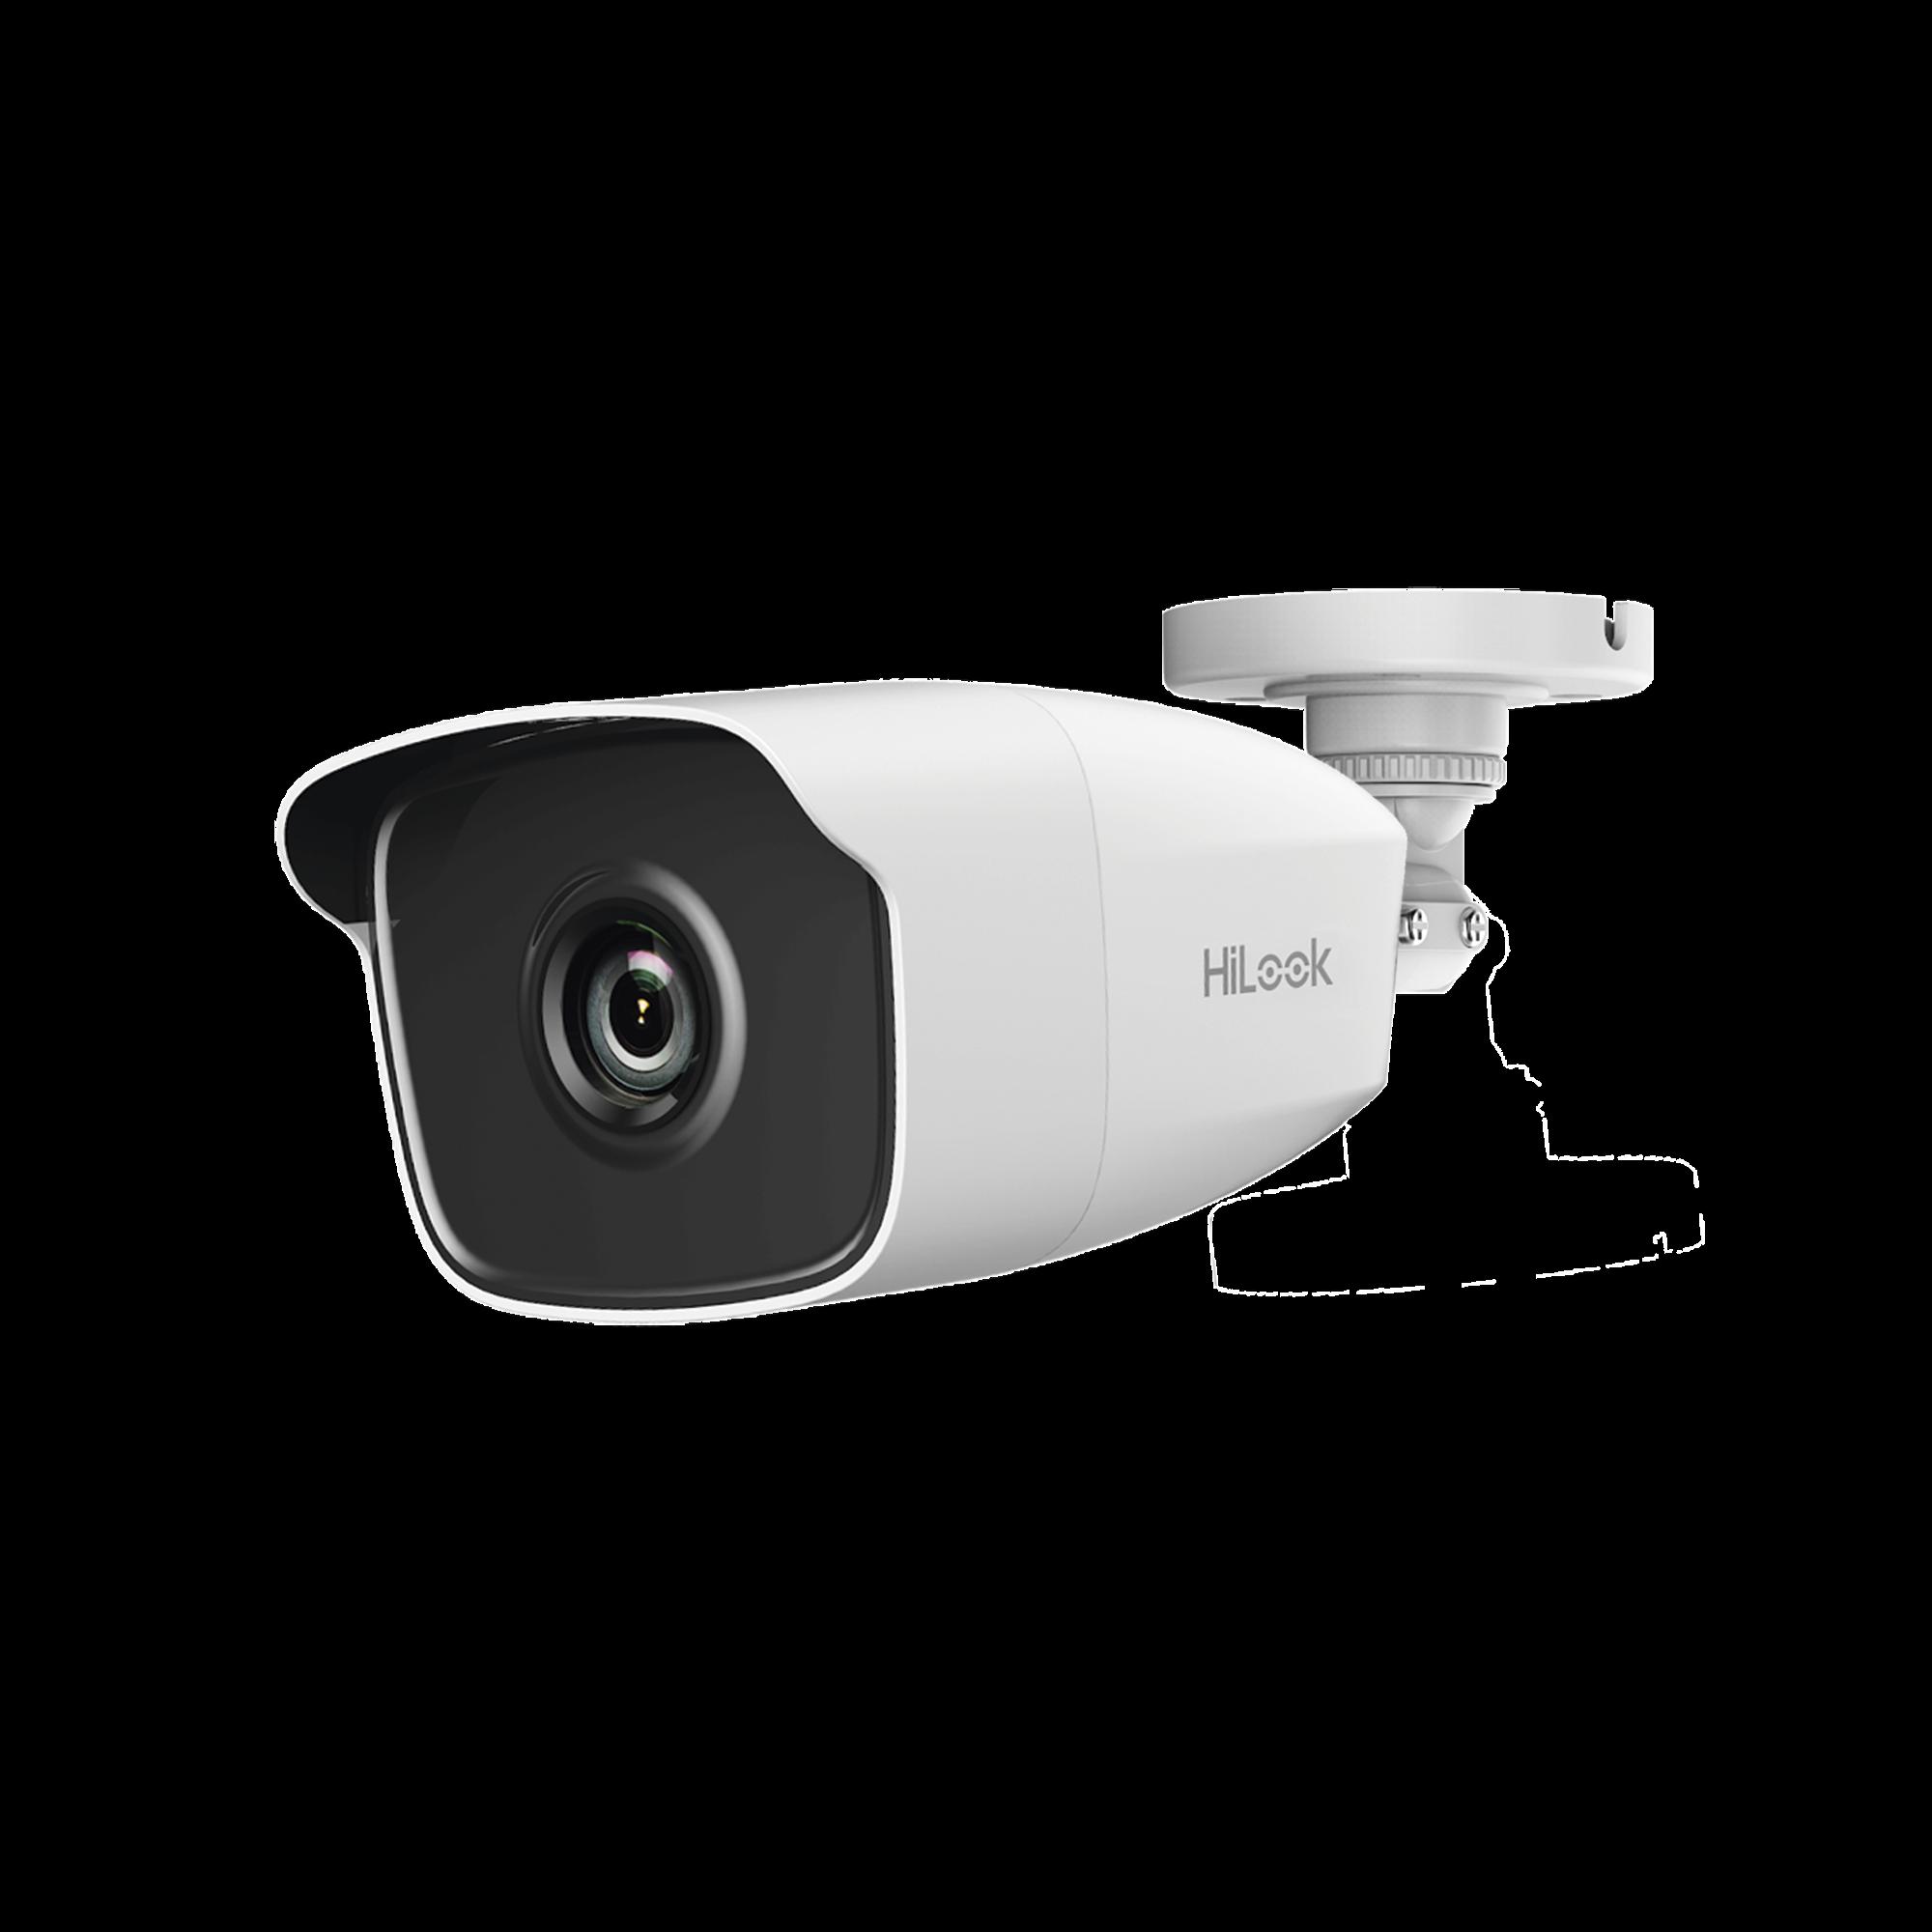 Bala TURBO 2 Megapixel (1080p) / Gran Angular 106? / Lente 2.8 mm / METAL/ IR EXIR Inteligente 50 mts / Exterior IP66 / Ultra Baja Iluminación / WDR 120 dB